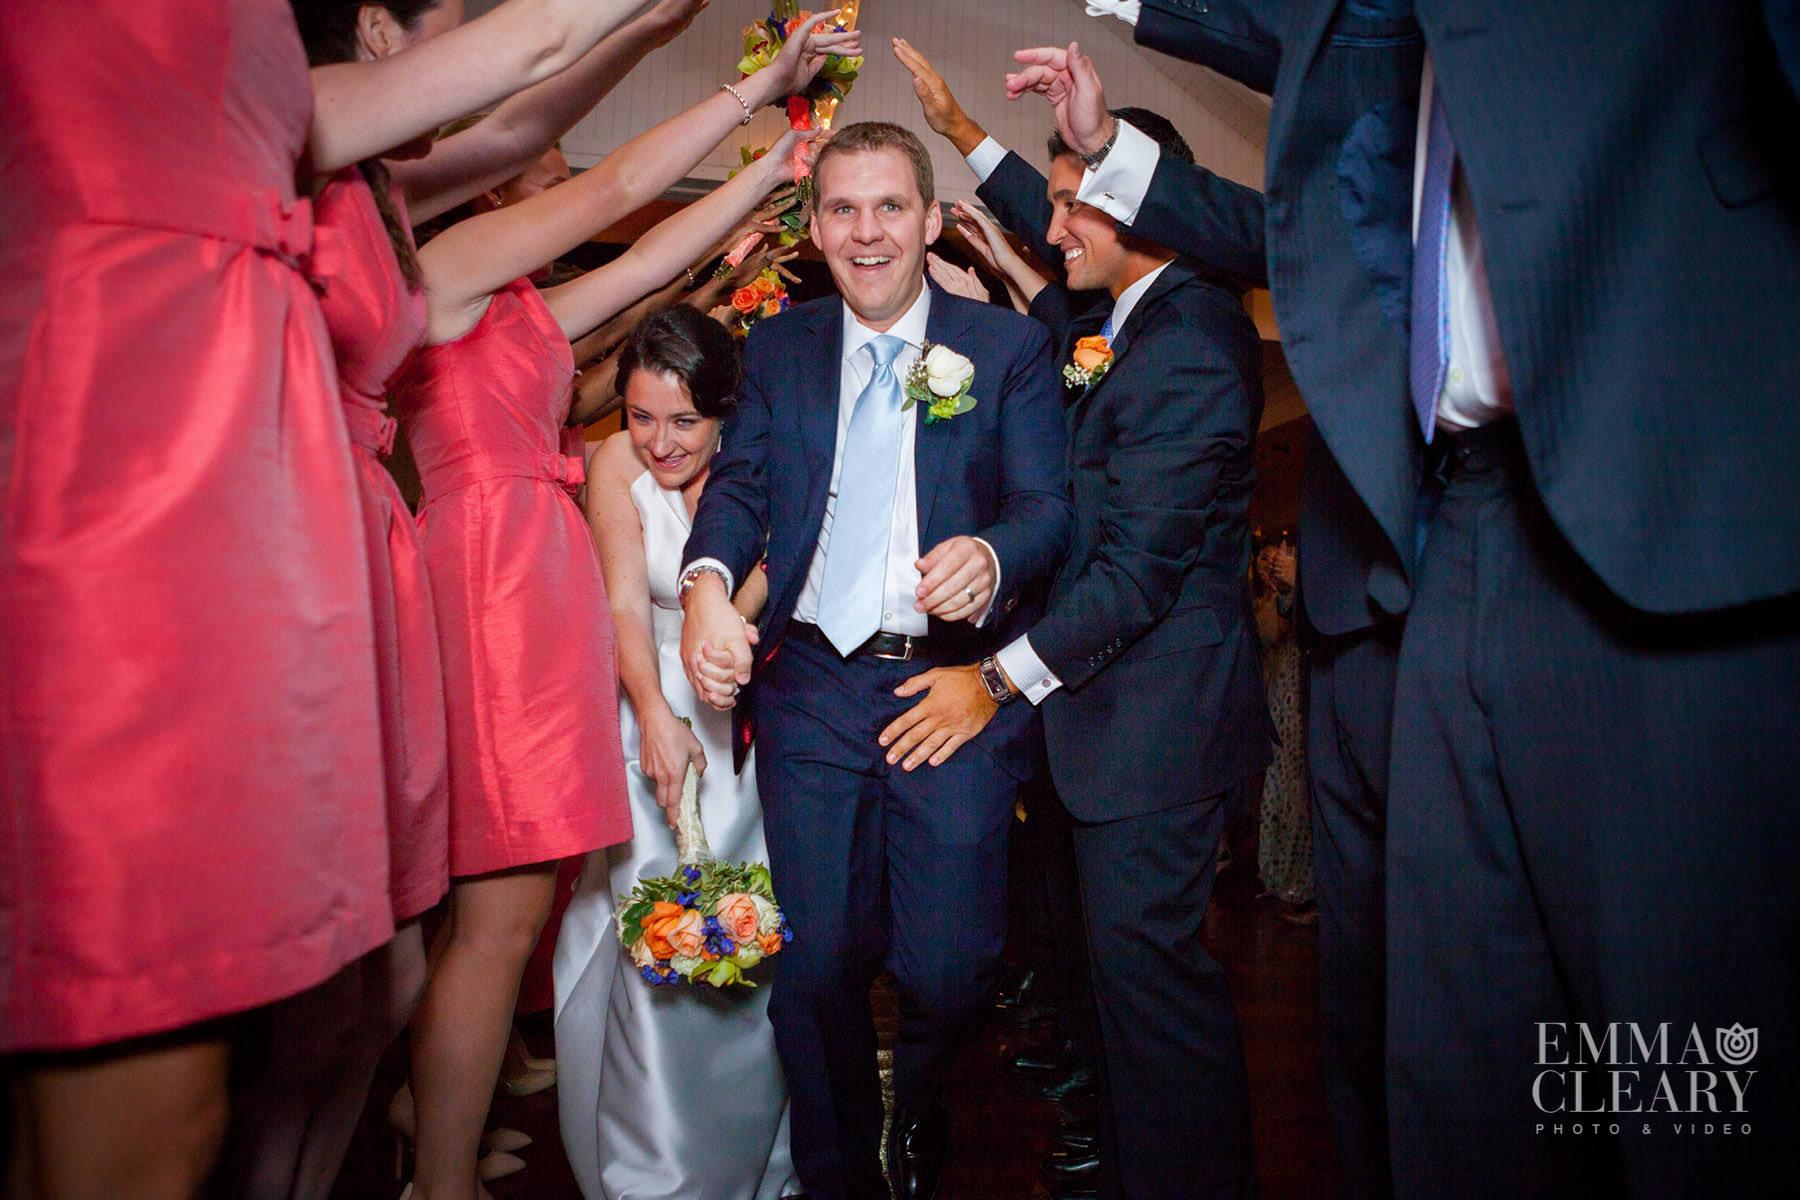 Emma Cleary Photography, Danfords Marina wedding22